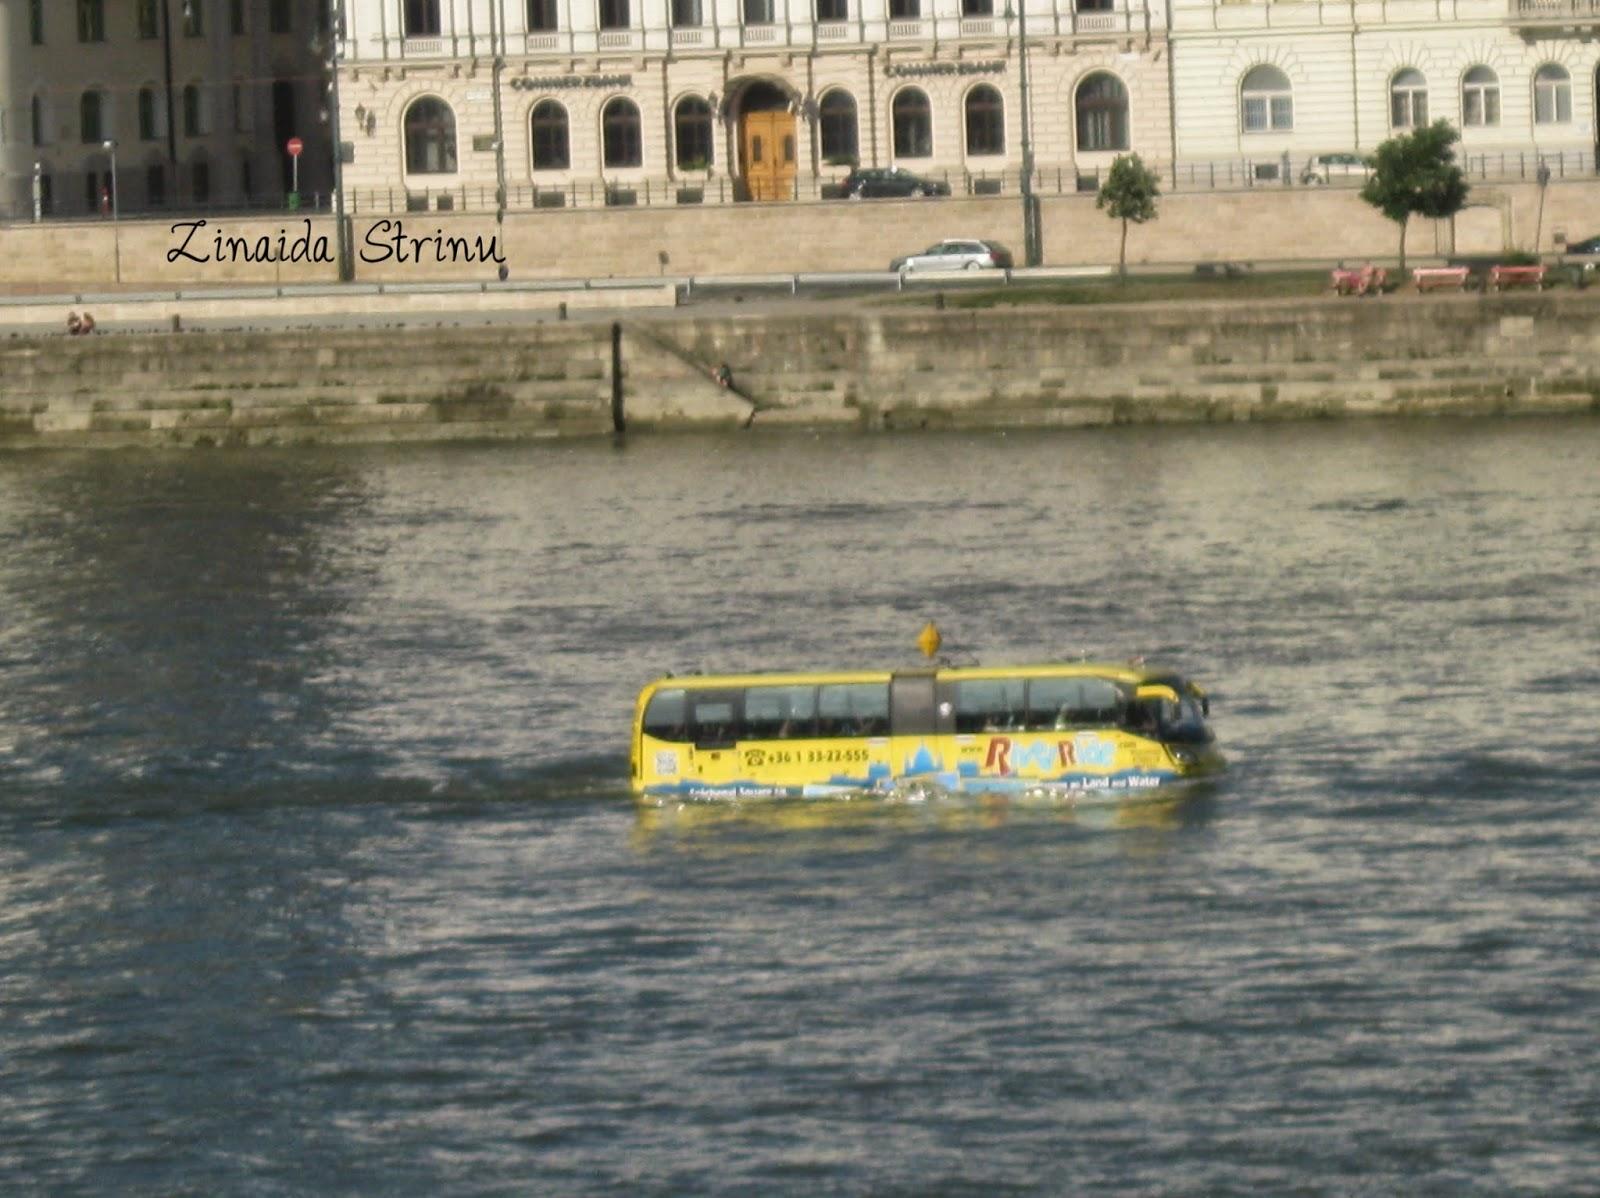 budapesta-autobuz-amfibie-2